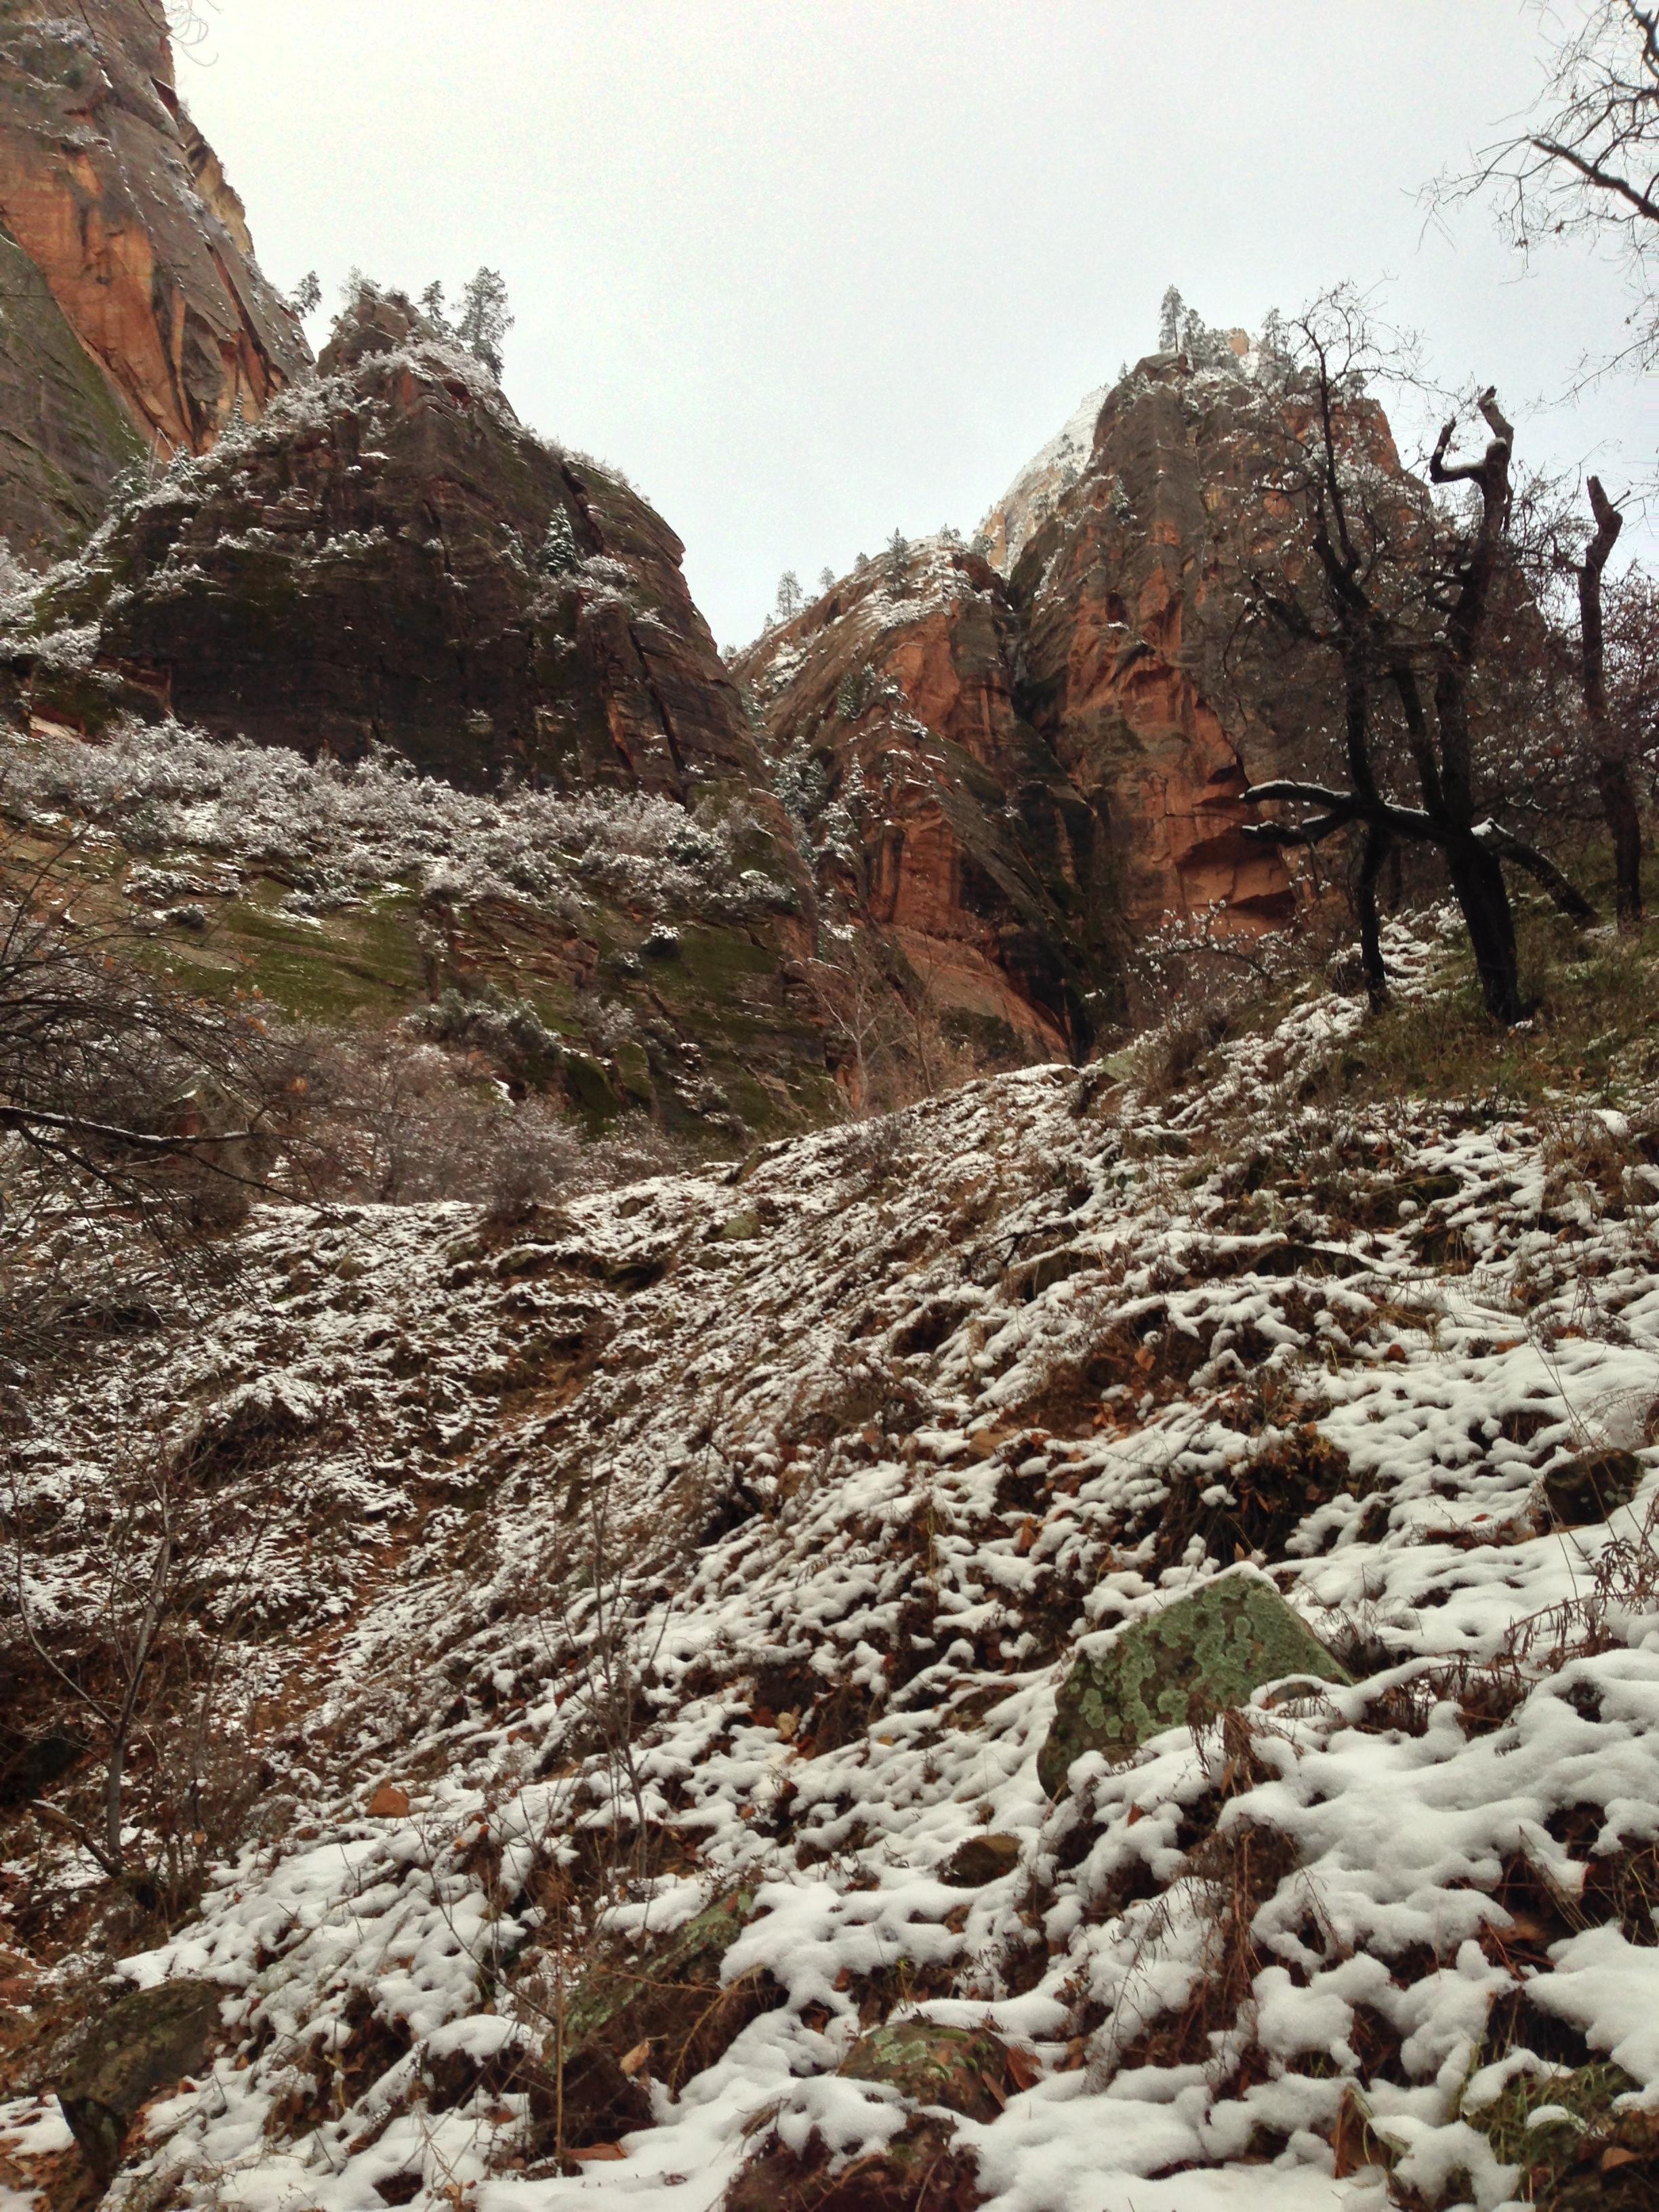 Heading up the trail toward Hidden Canyon